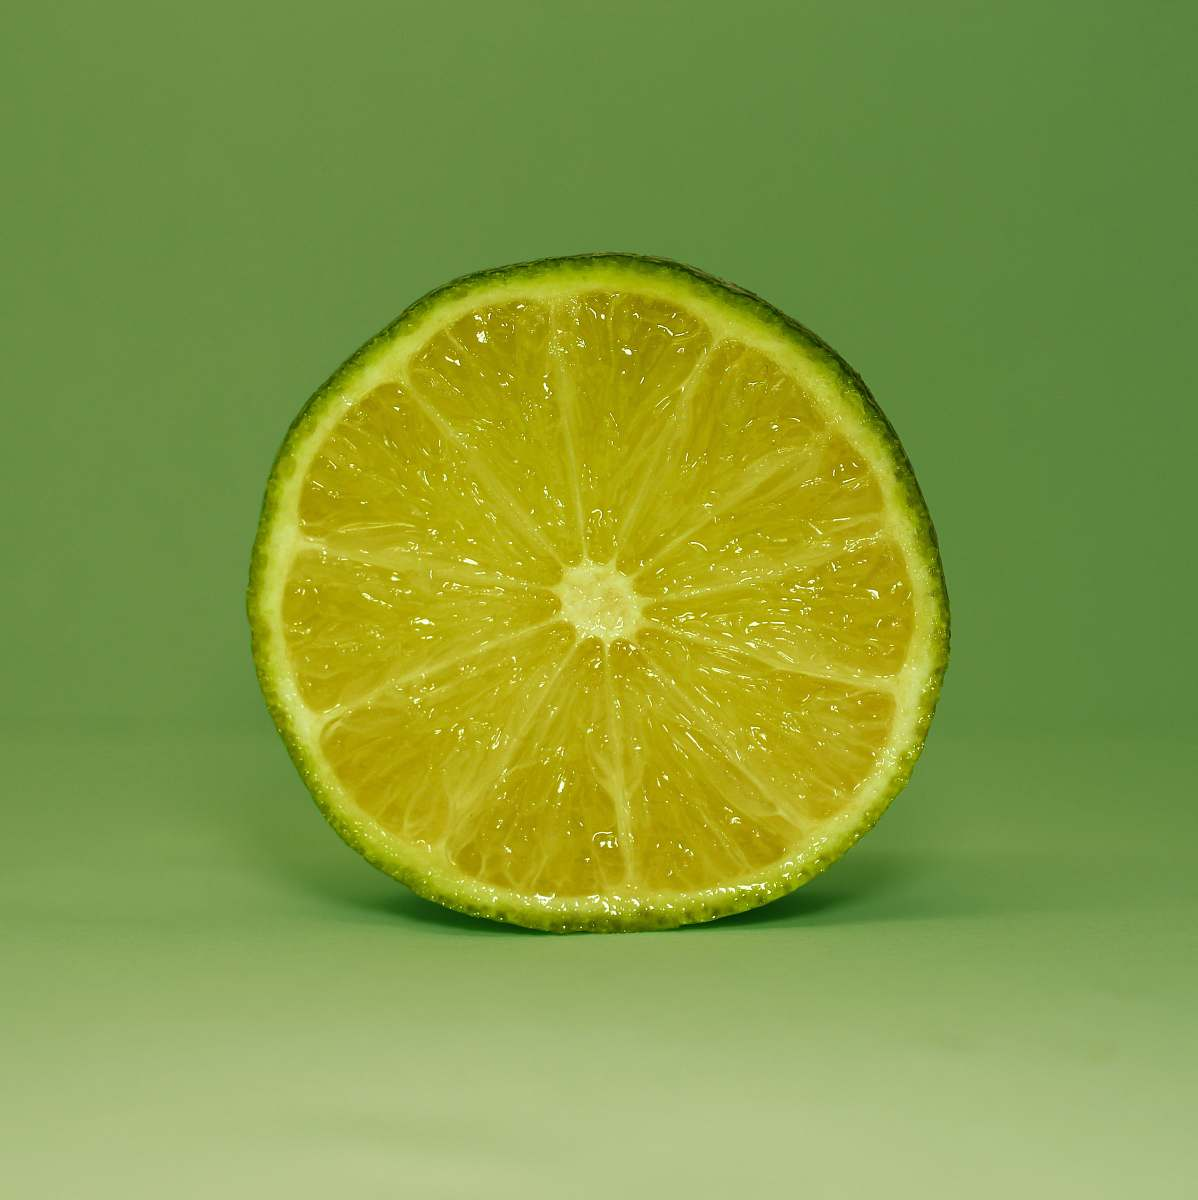 stock photos free  of food round citrus fruit plant